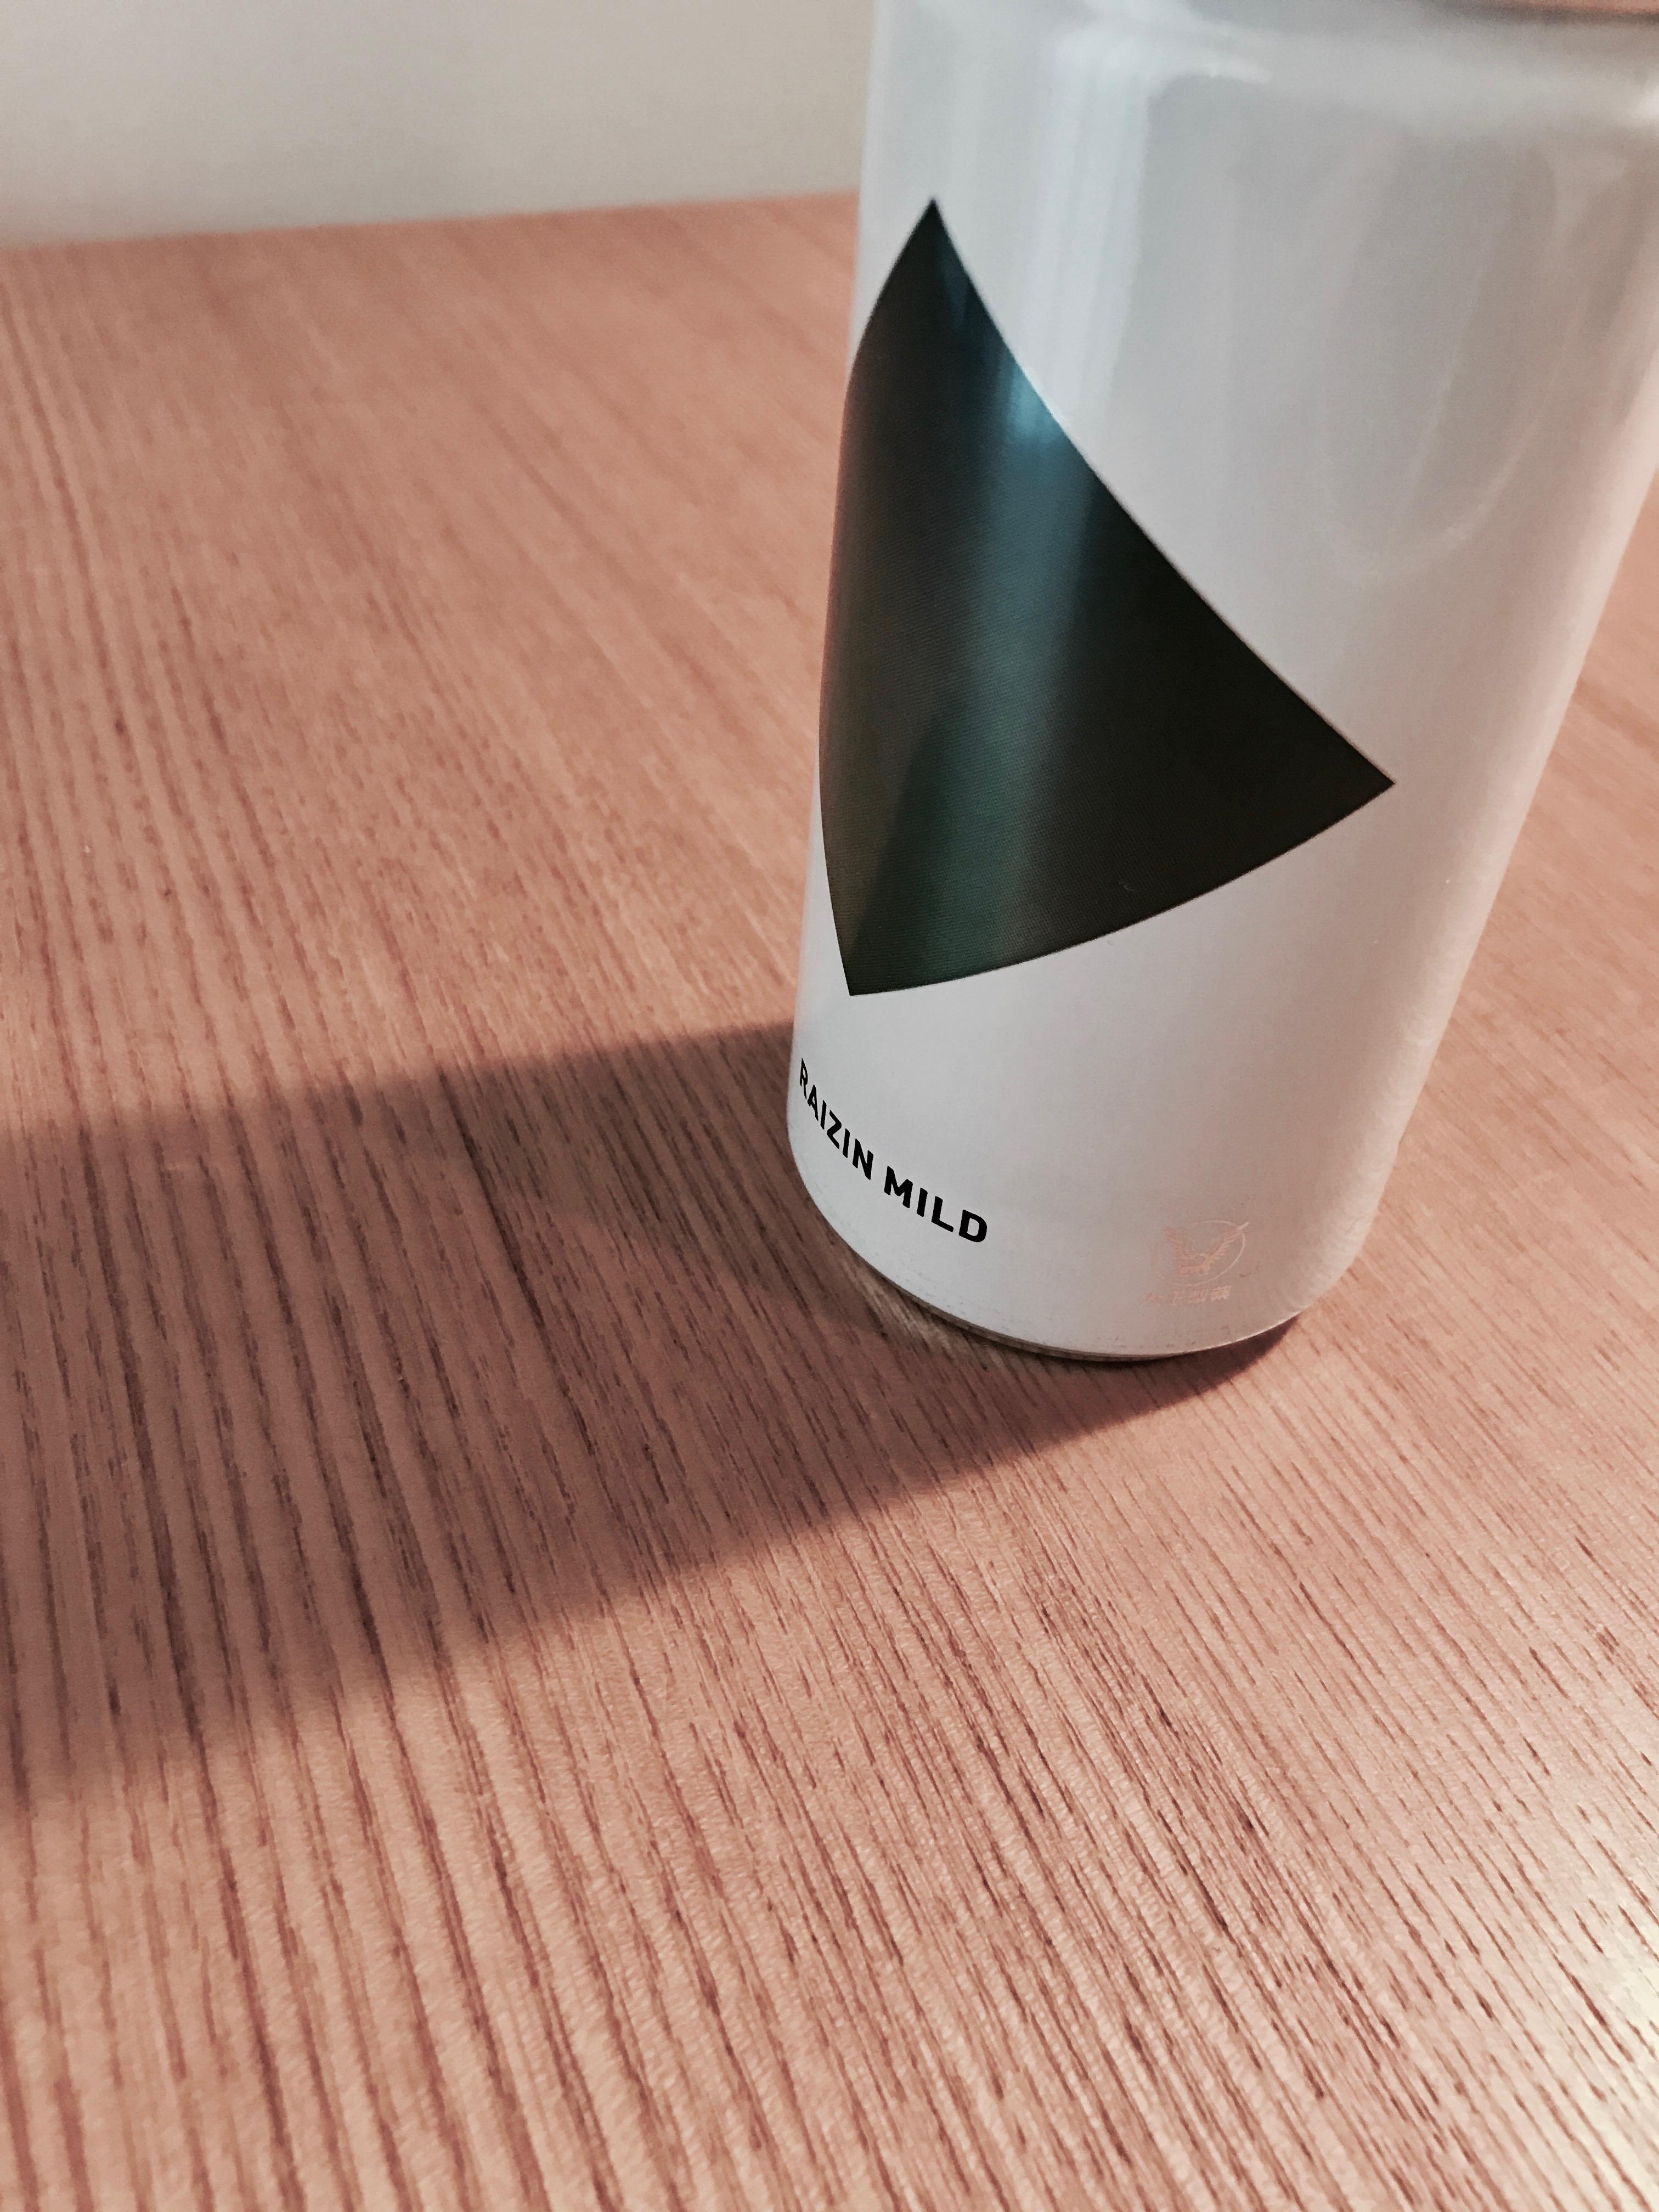 nendoさんが考えたRAIZINのパッケージからデザインのアプローチについて考えてみた